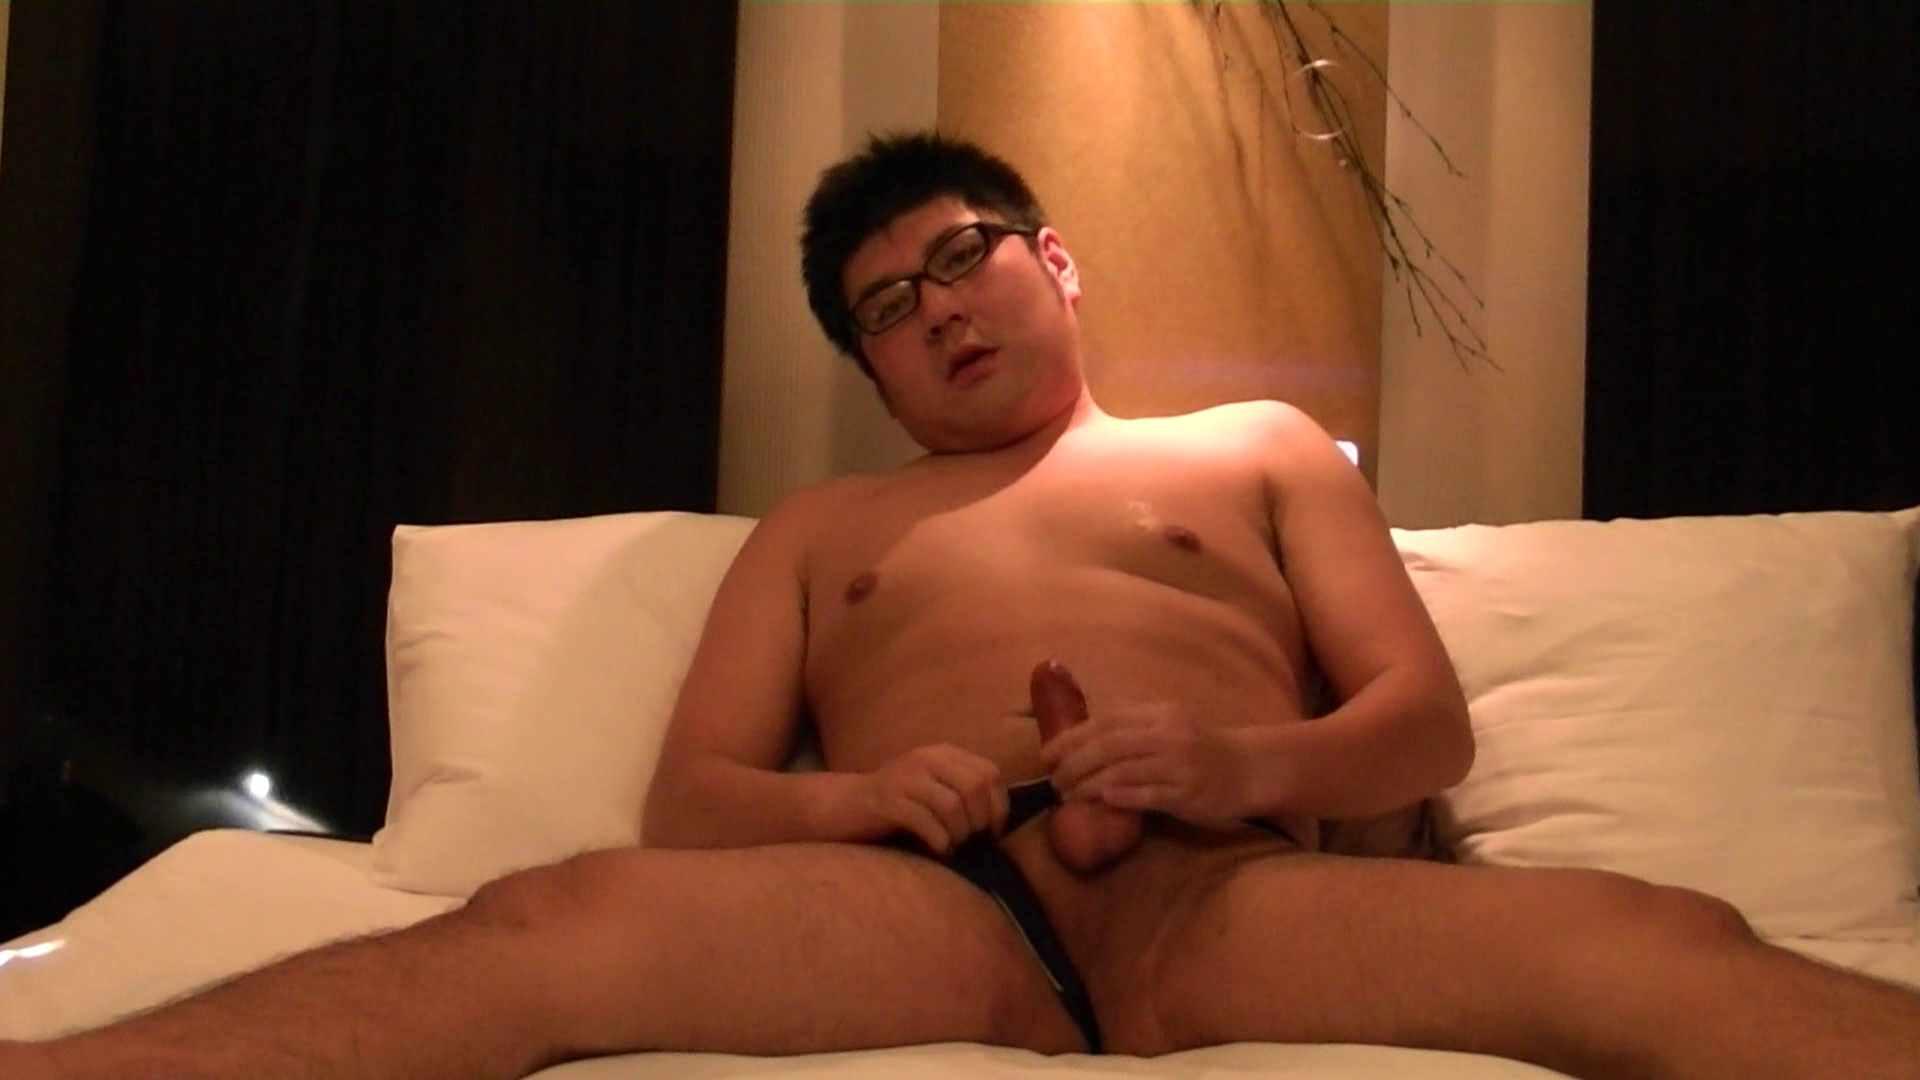 Mr.オナックスさん投稿!HD 貴方のオナニー三万円で撮影させてください。VOL.02 前編 0 | オナニー特集  72pic 43